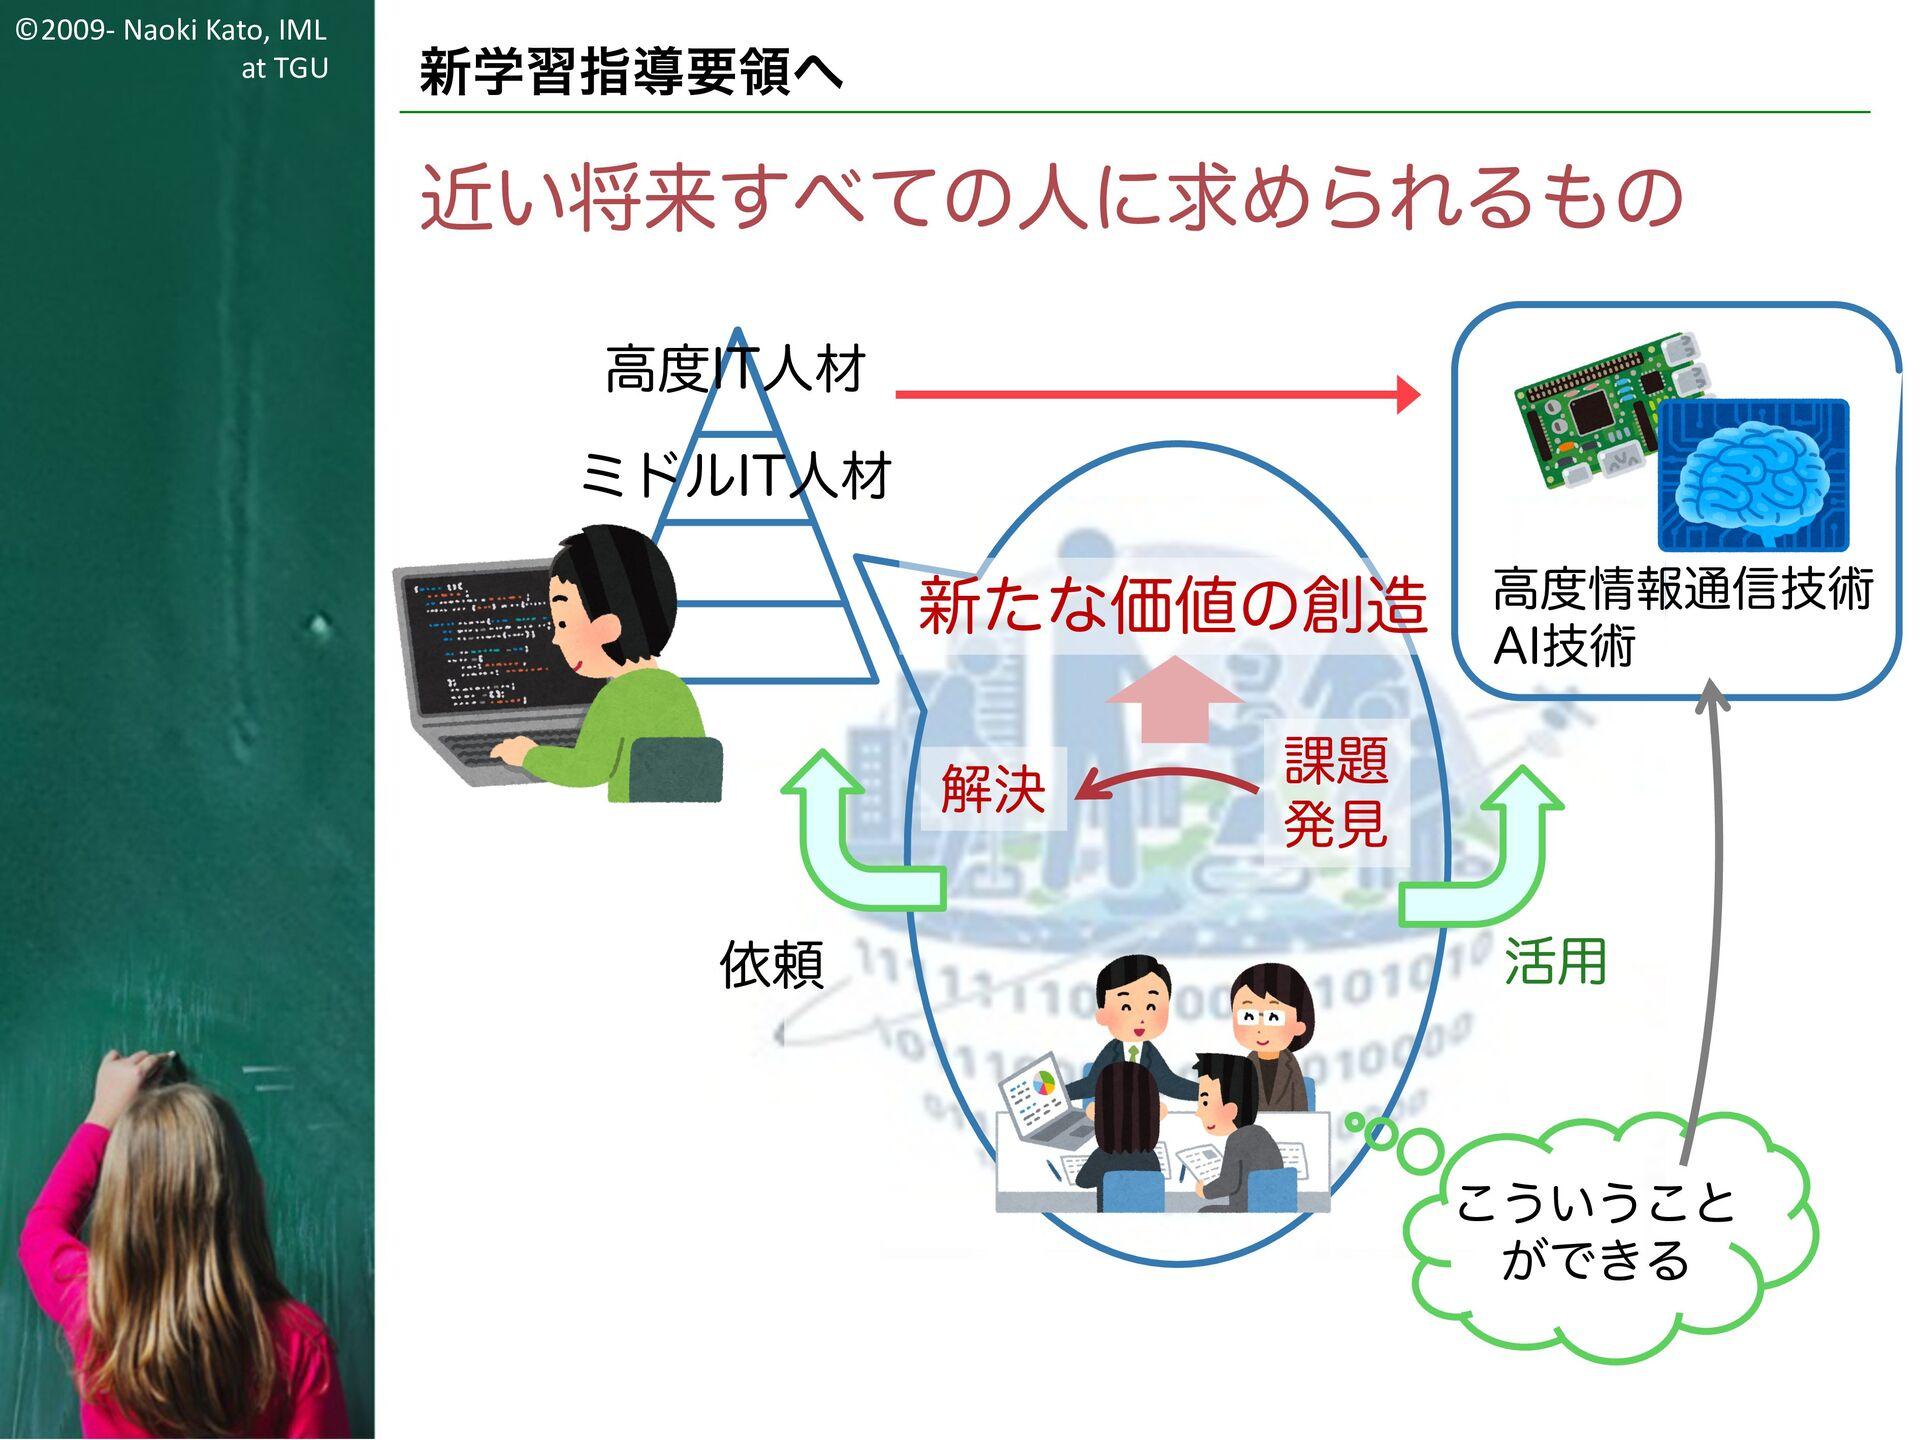 ©2009- Naoki Kato, IML at TGU 新学習指導要領へ 産業(工業)革命...